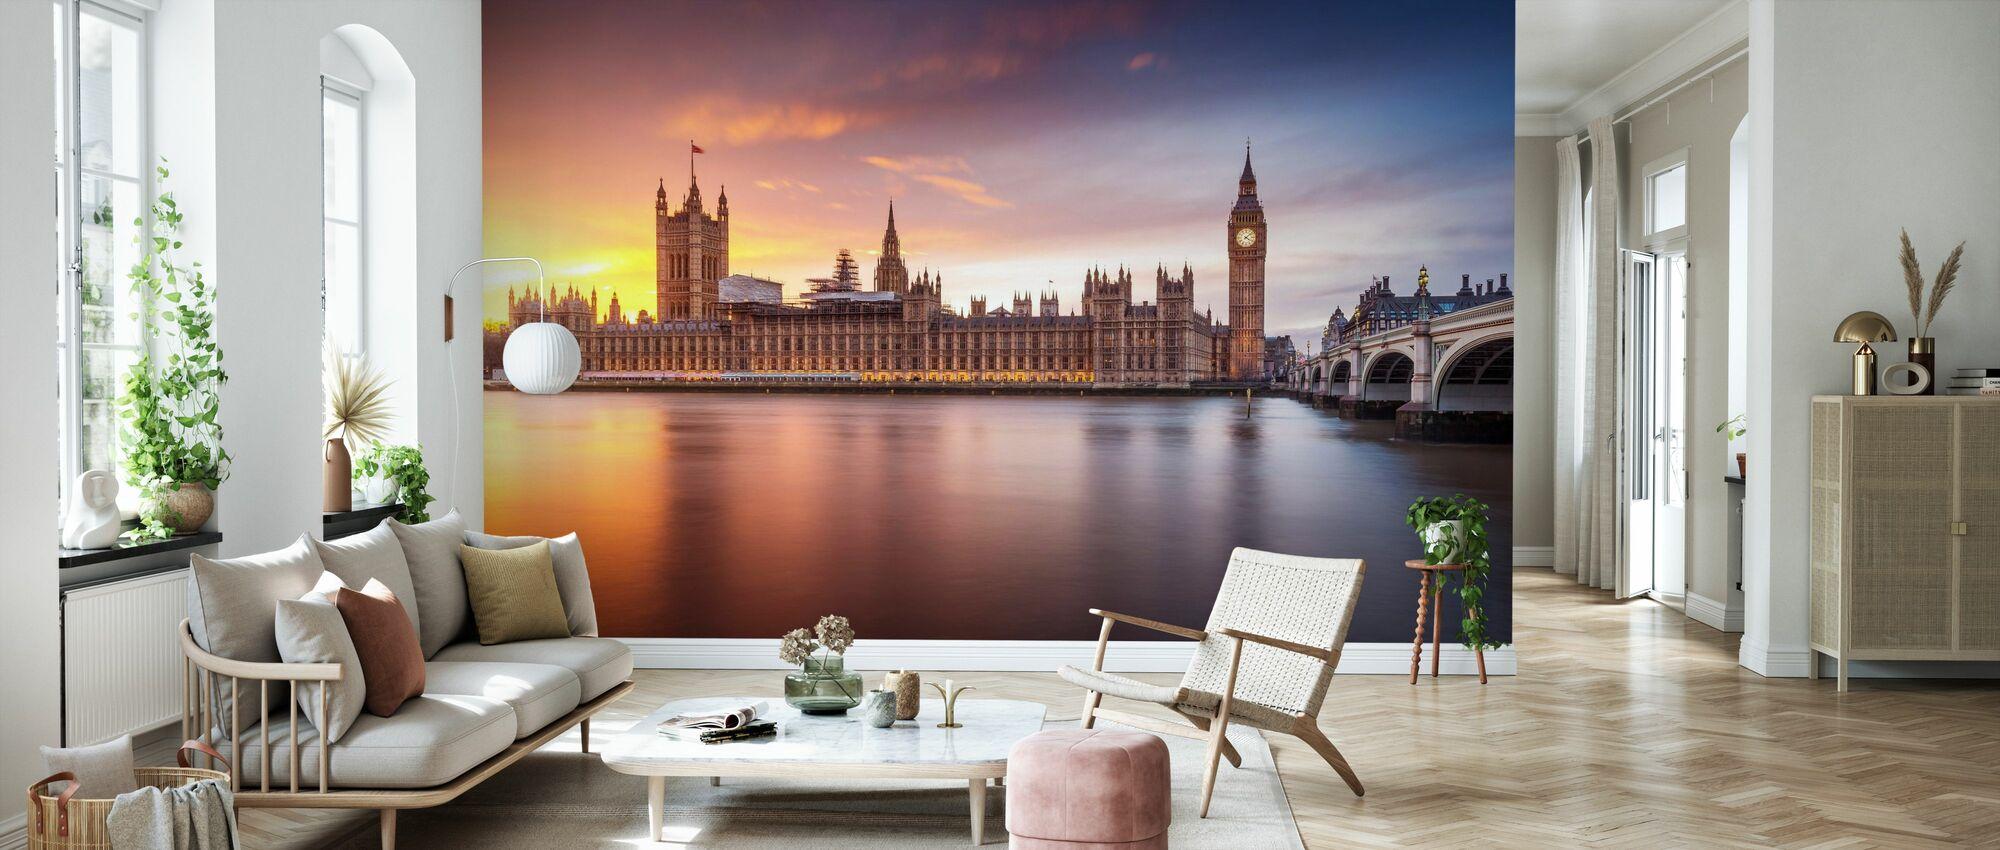 Westminster Sunset - Tapet - Stue